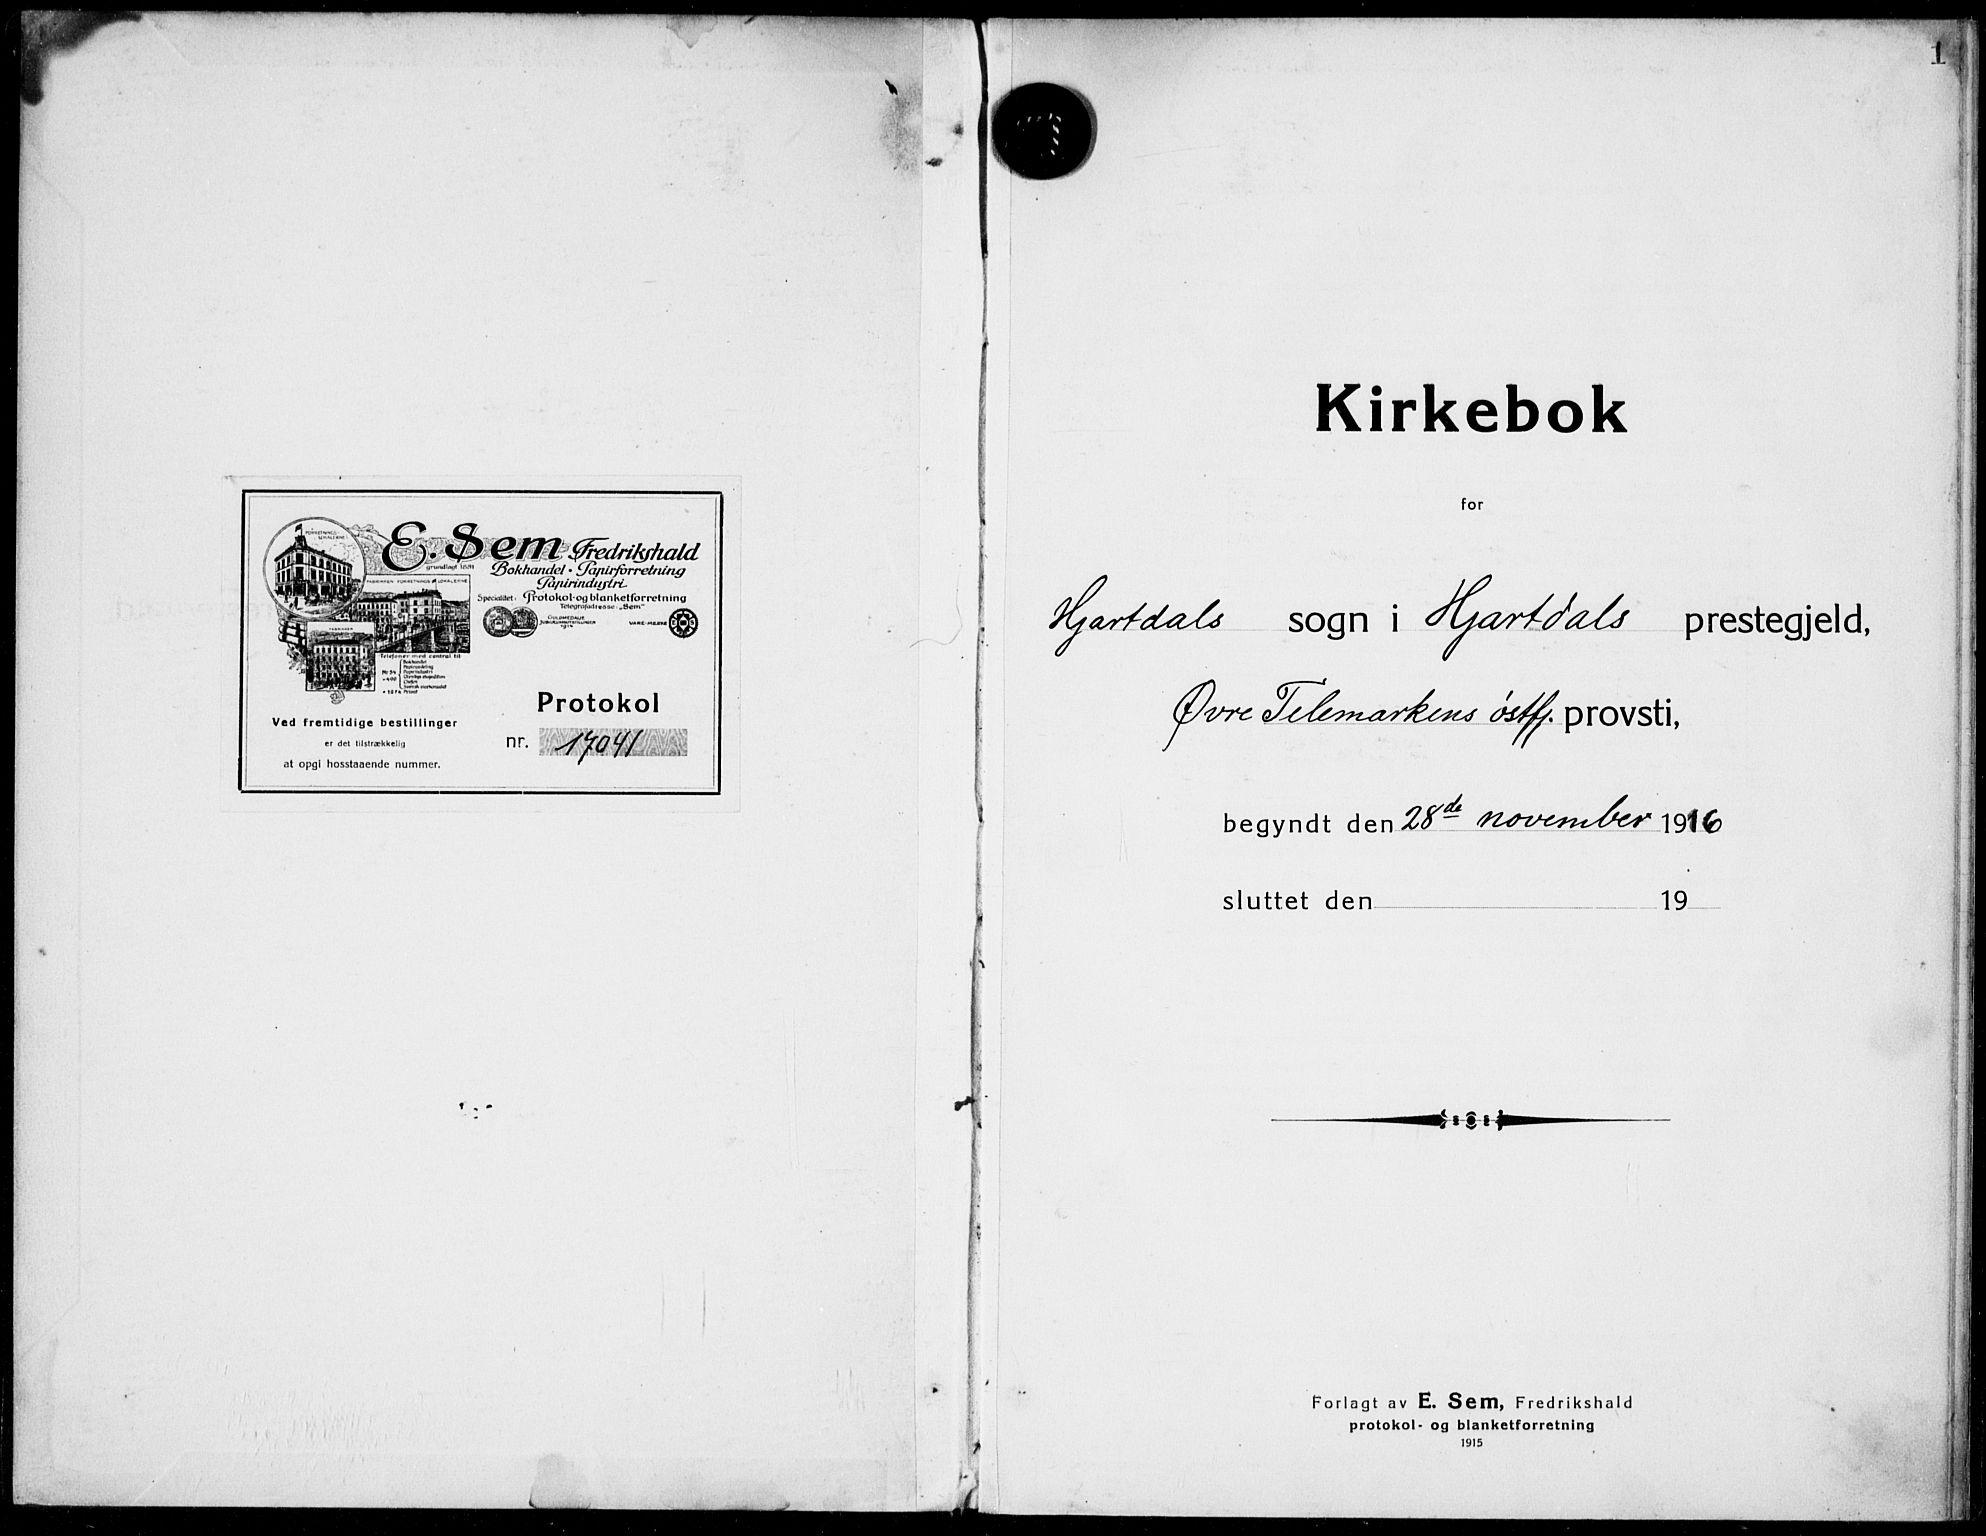 SAKO, Hjartdal kirkebøker, F/Fa/L0011: Ministerialbok nr. I 11, 1916-1929, s. 1